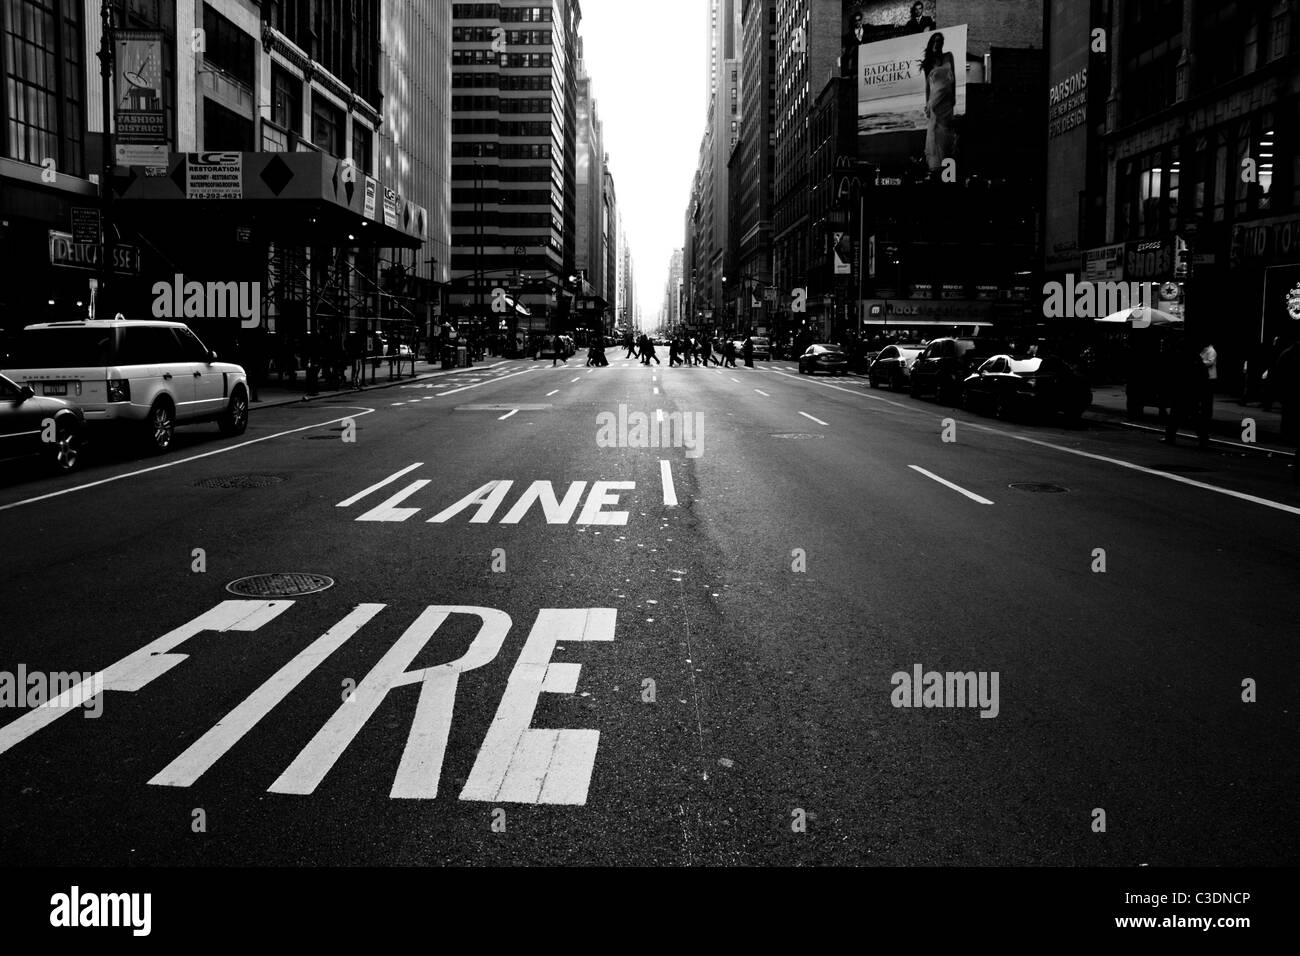 Fire lane - Stock Image